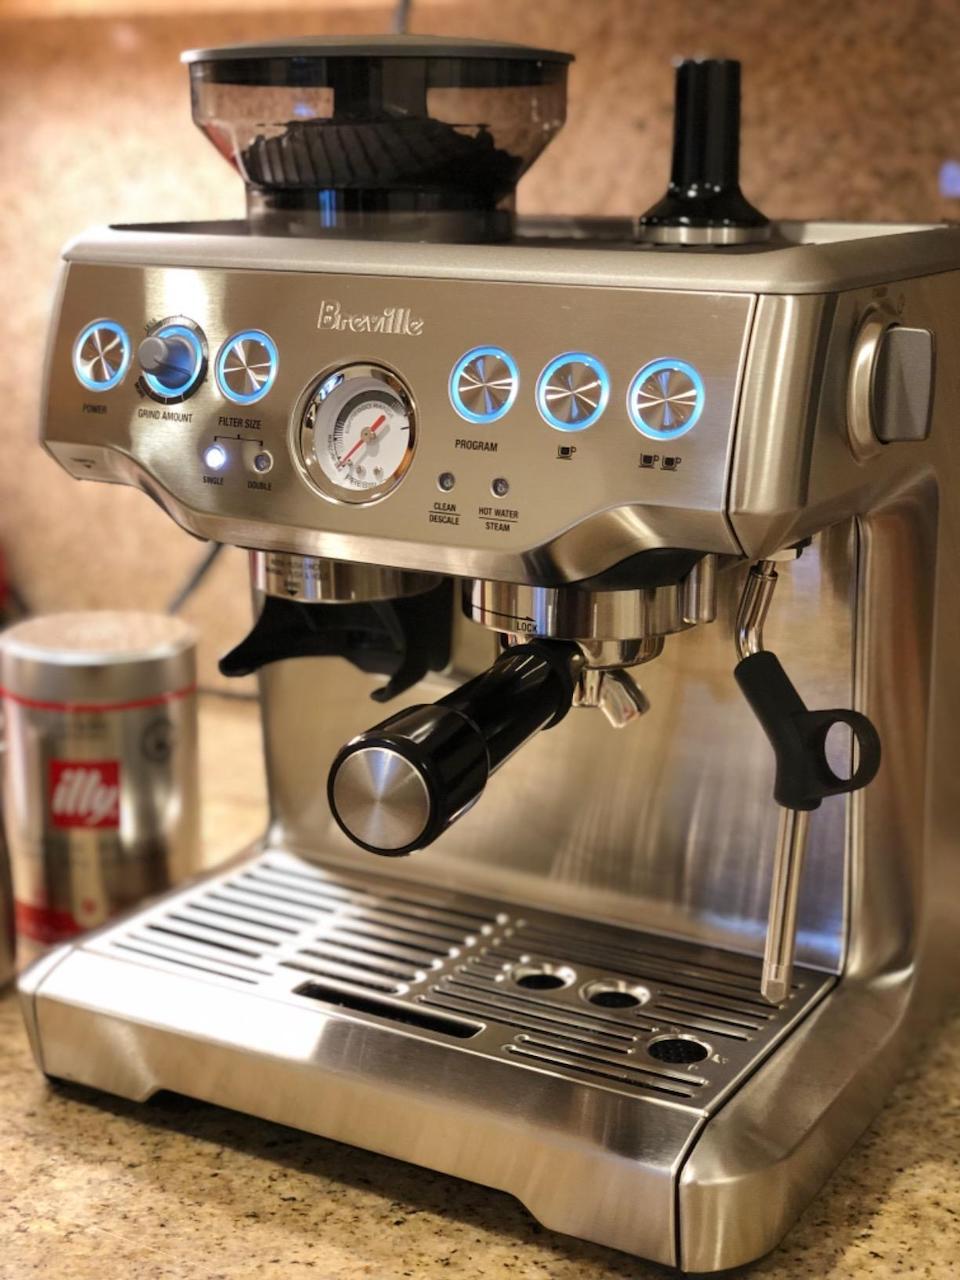 close up of breville espresso machine